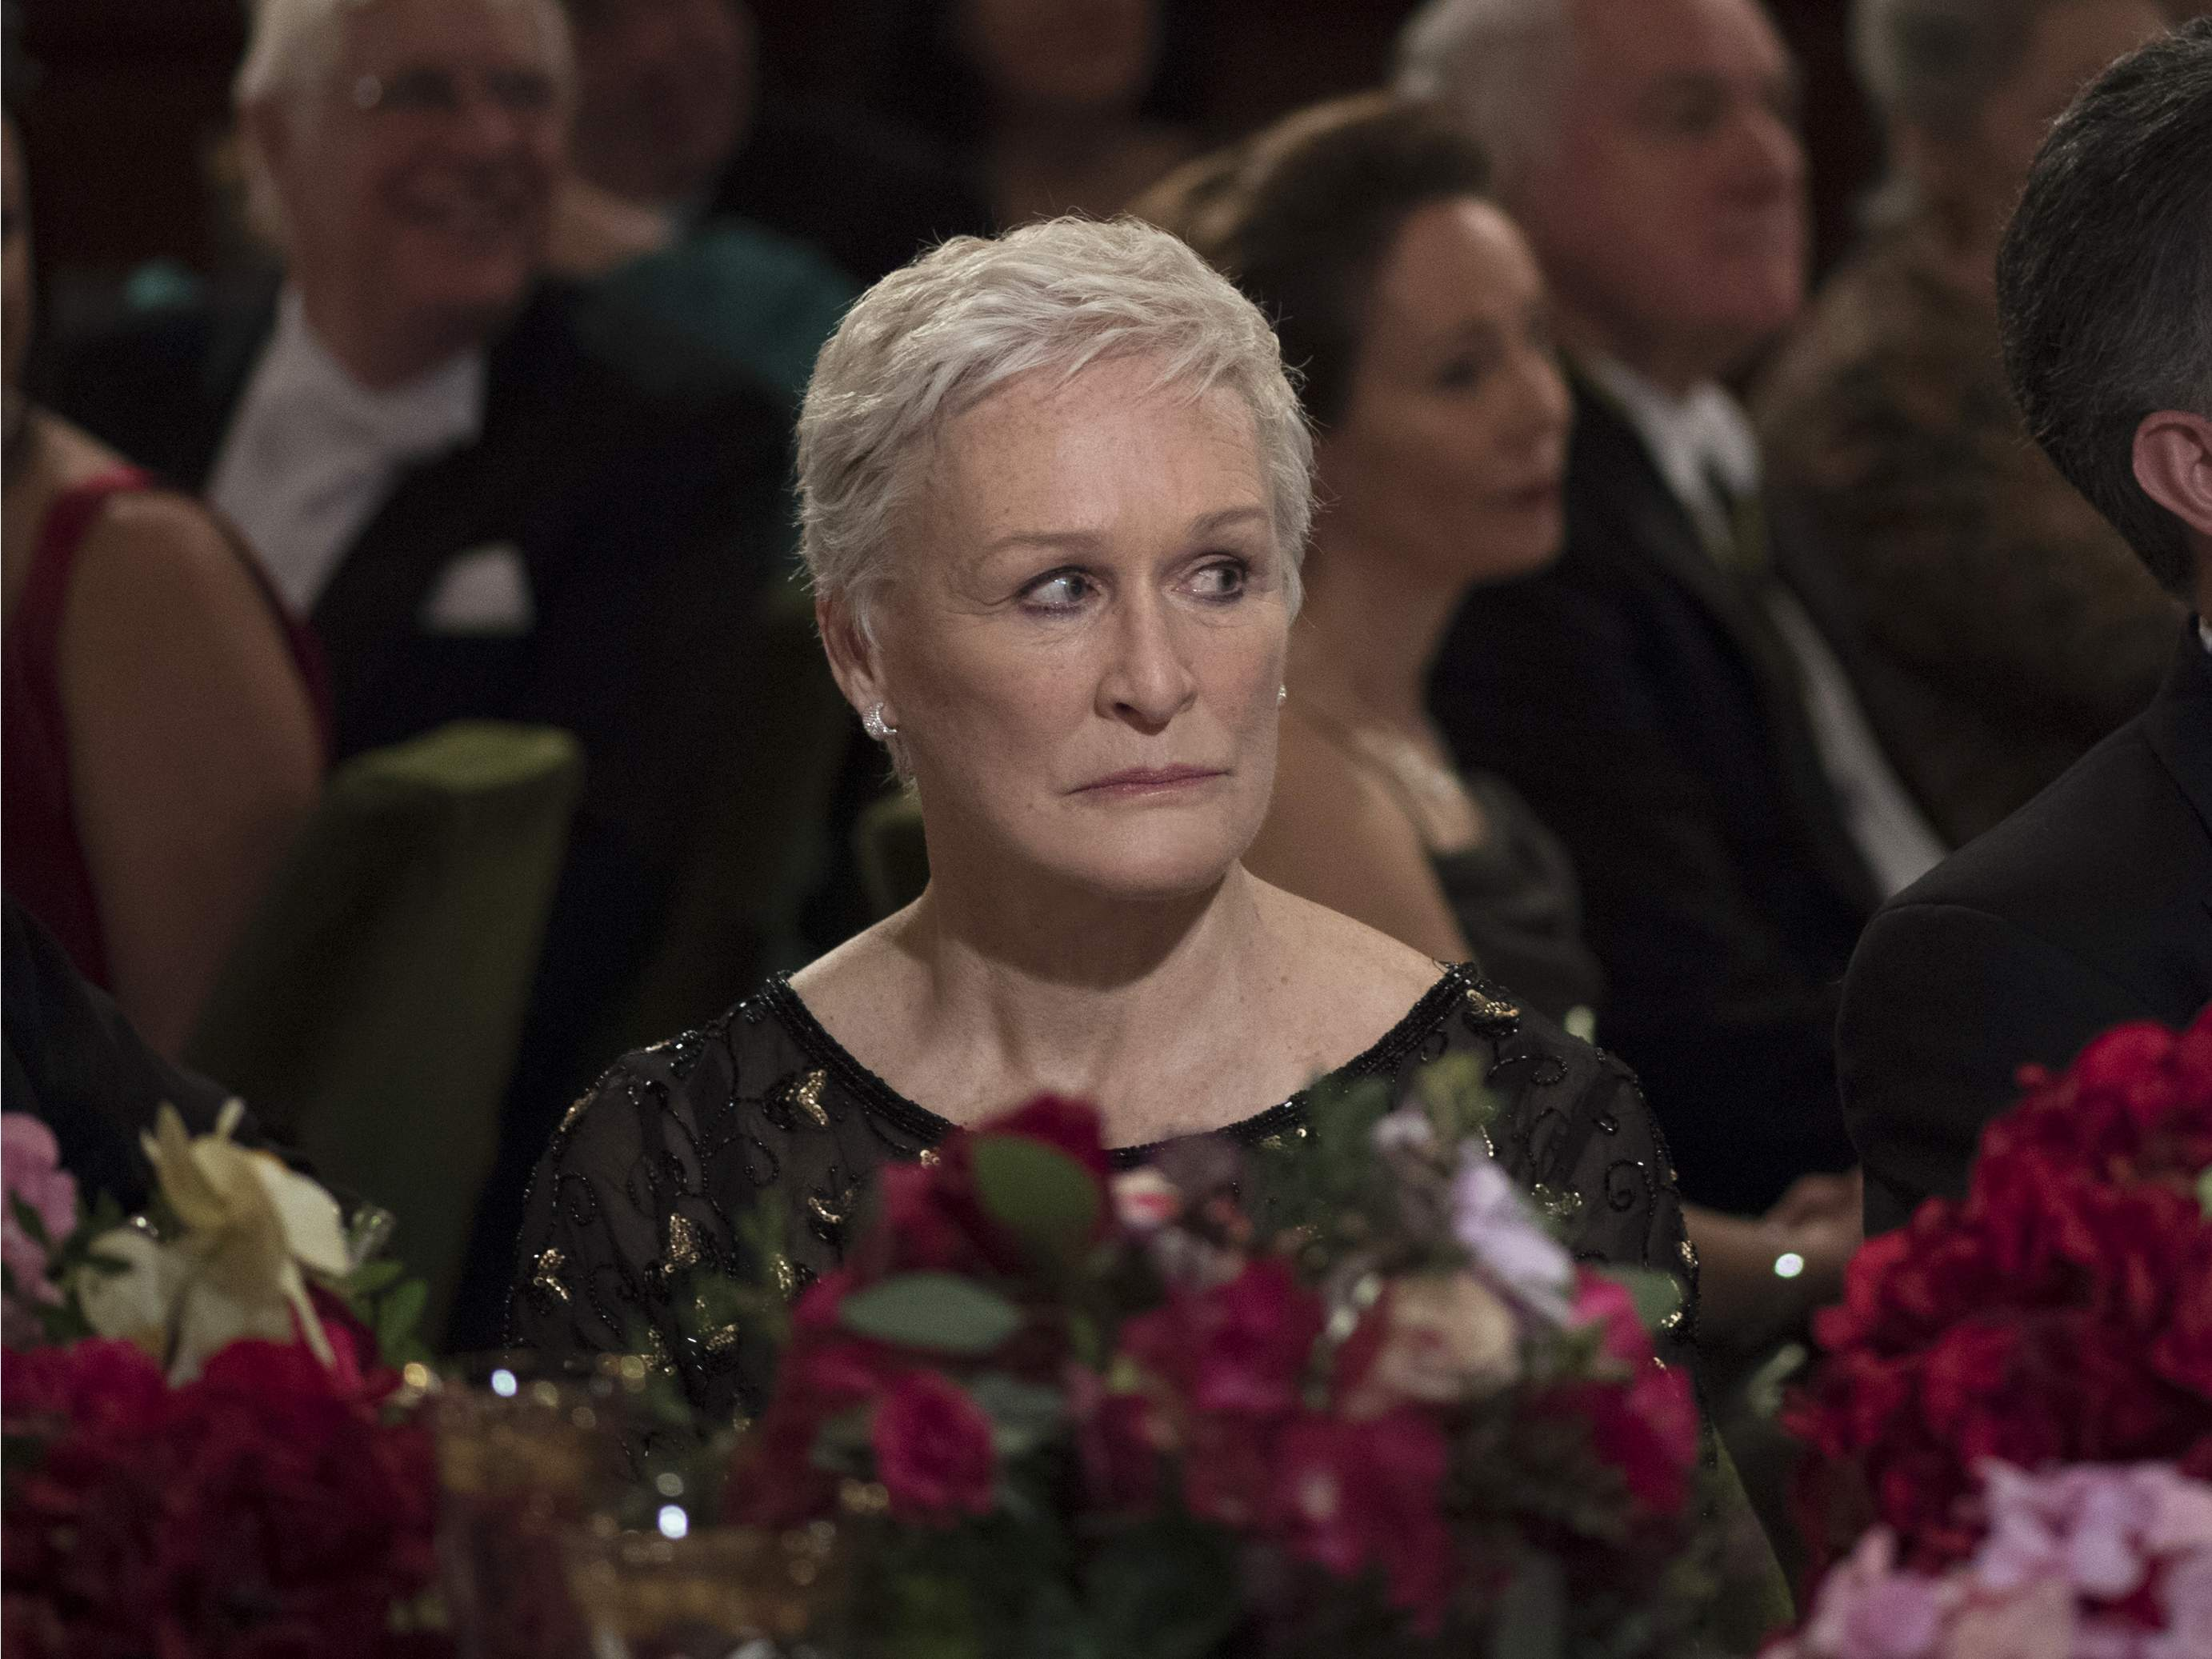 Will Glenn Close's role in 'The Wife' finally win her an Oscar? Film Critic Dann Gire predicts it will.